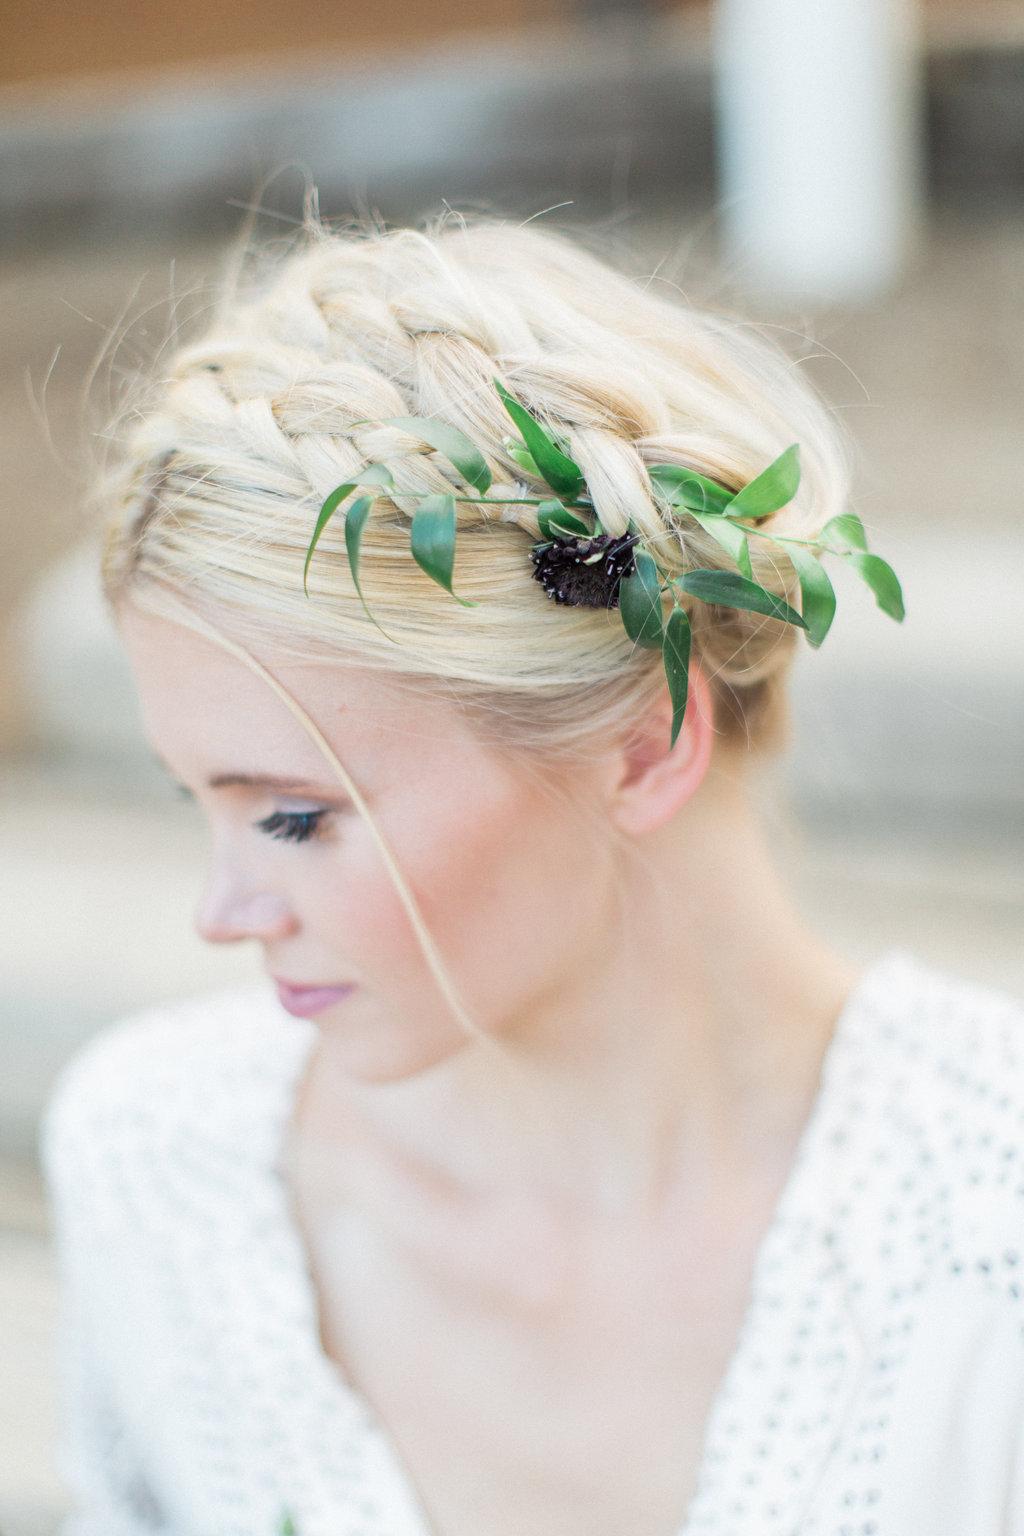 bohemian wedding, milkmaid braids, bridal updo milkmaid braids, blonde hair braided bridal updo